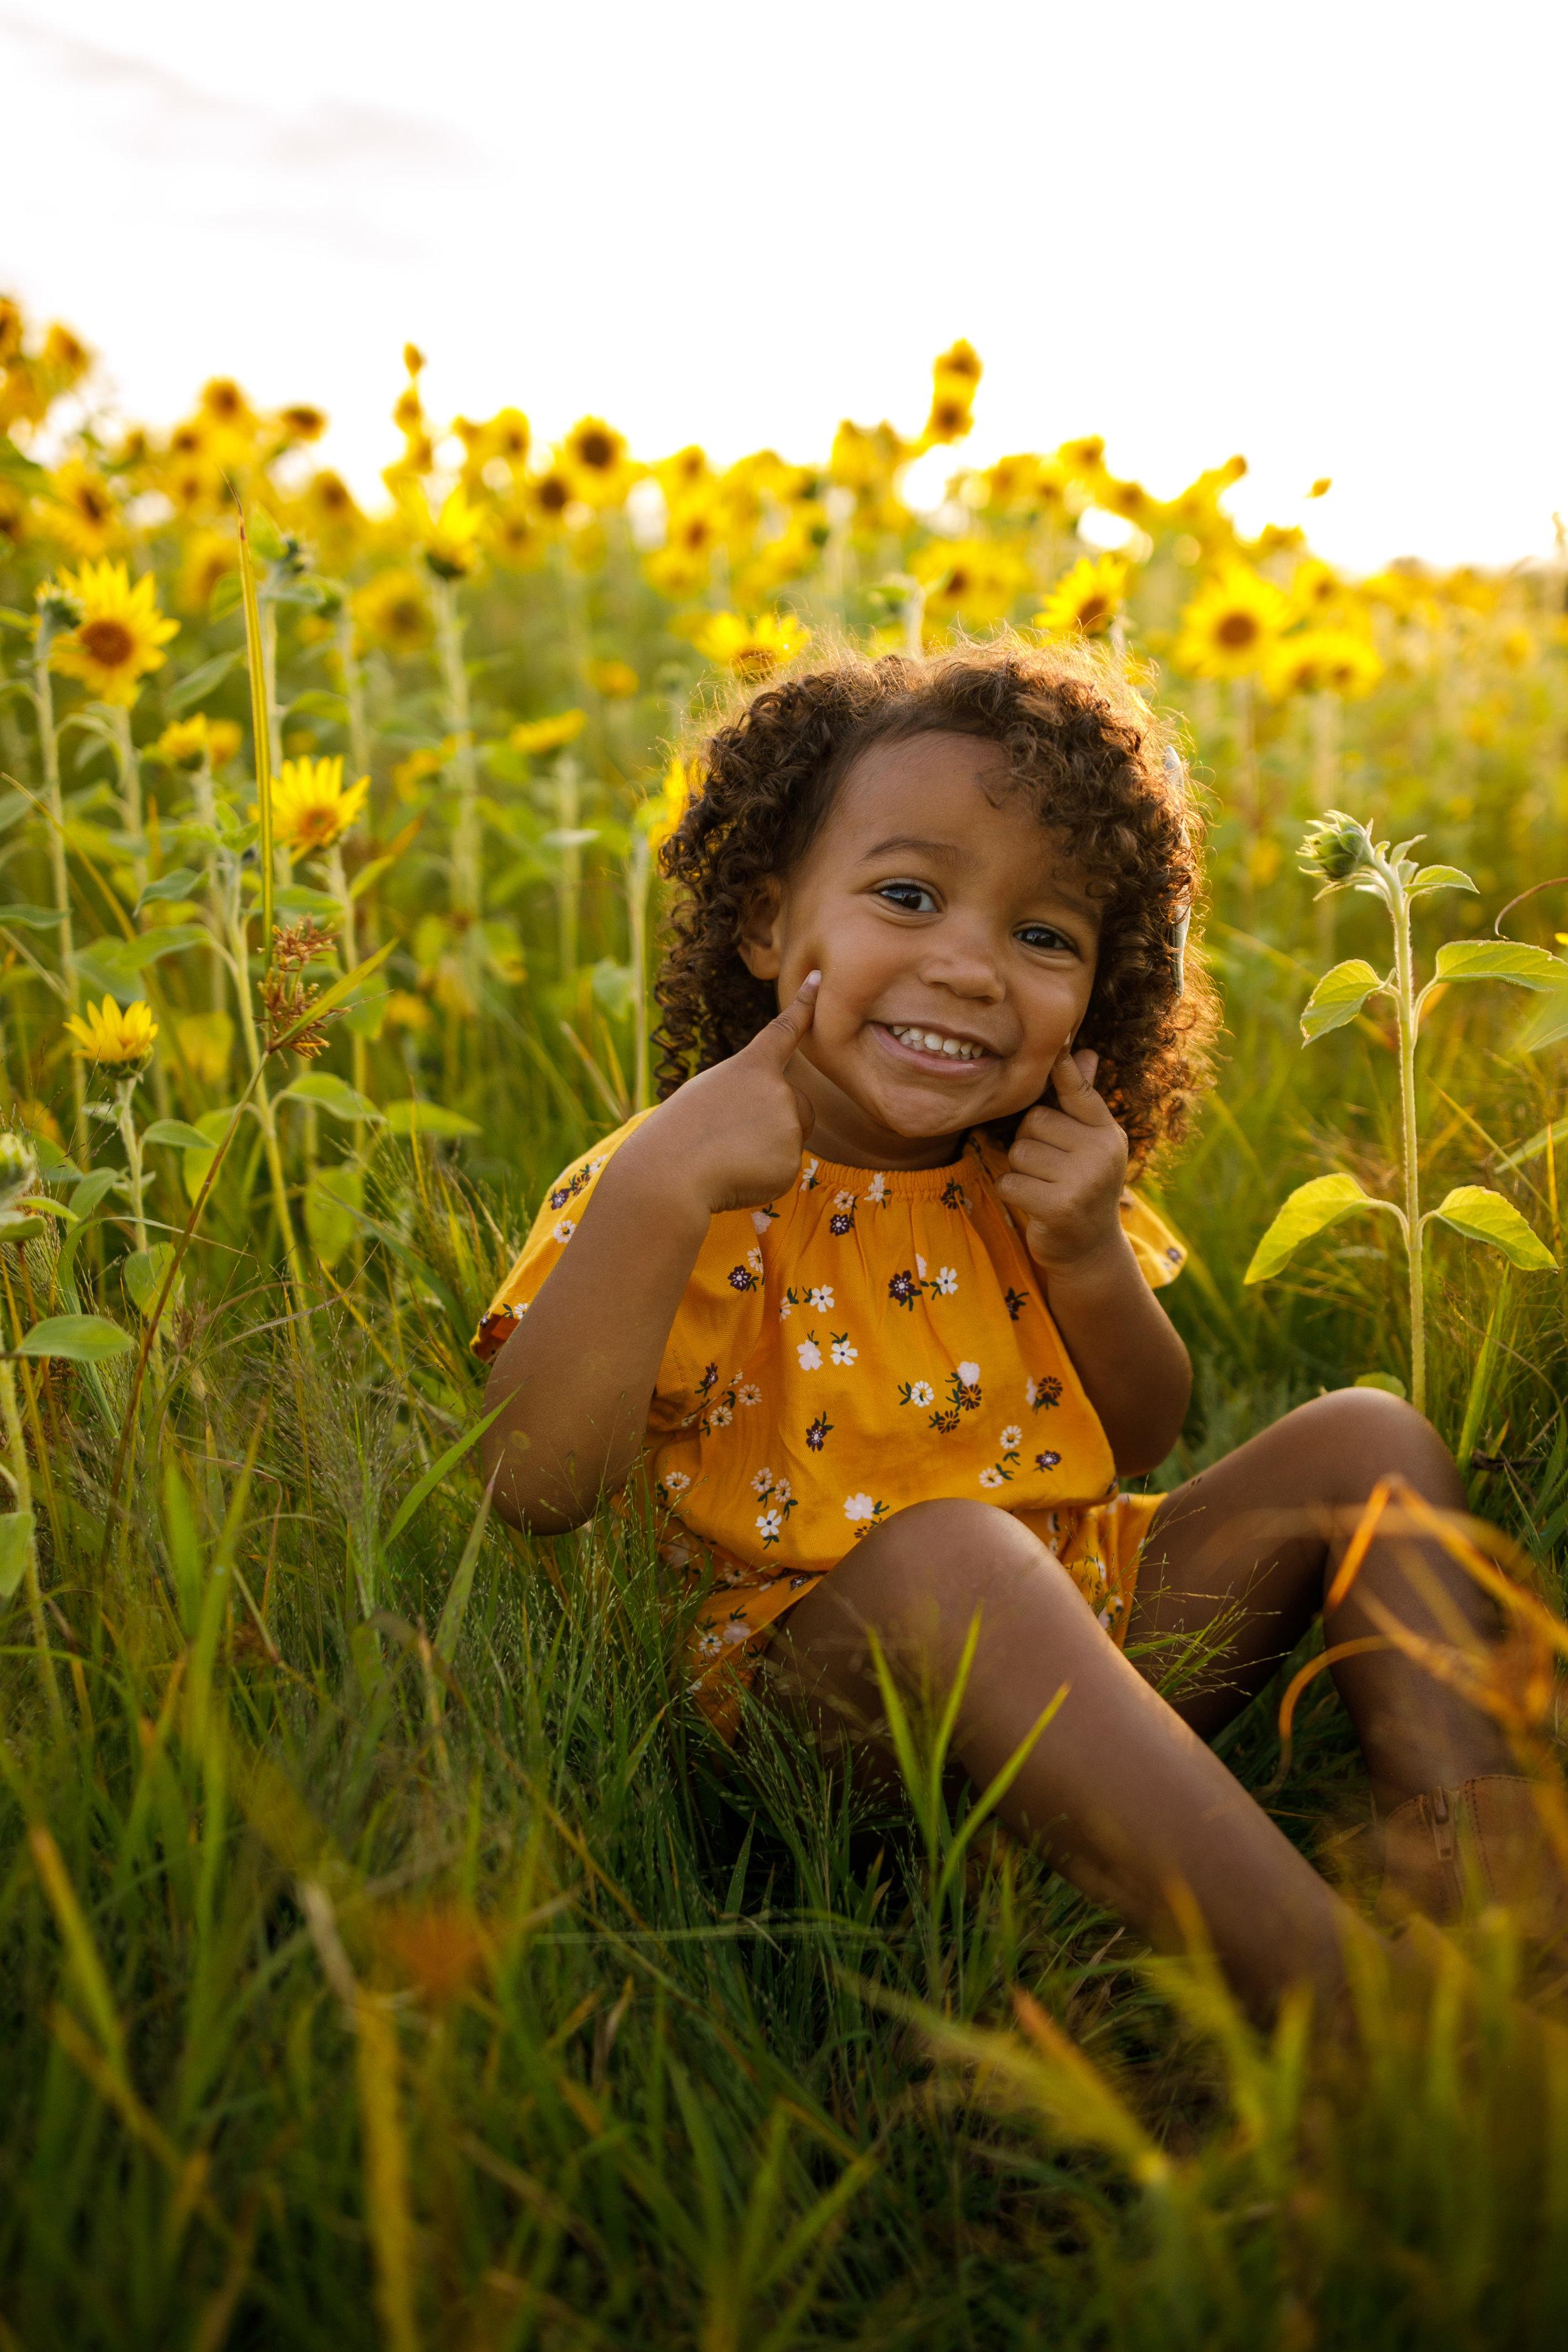 Morris Family Summer 2019 - Grand Rapids Photographer - Grand Rapids Family Photographer - Ed Dunneback and Girls - J Darling Photo 025.jpg